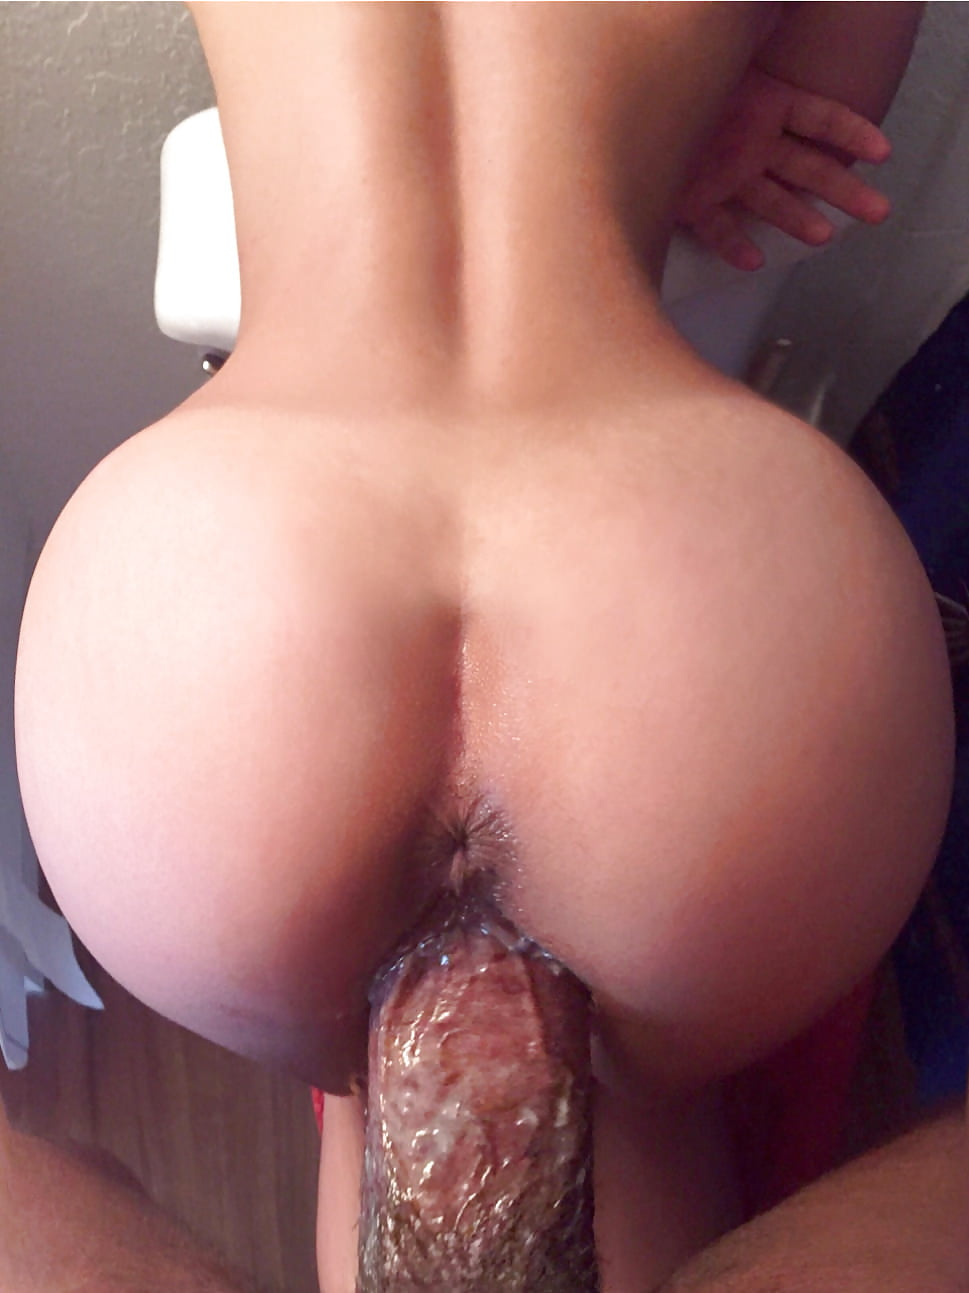 Порно фото накаченных попок — pic 1